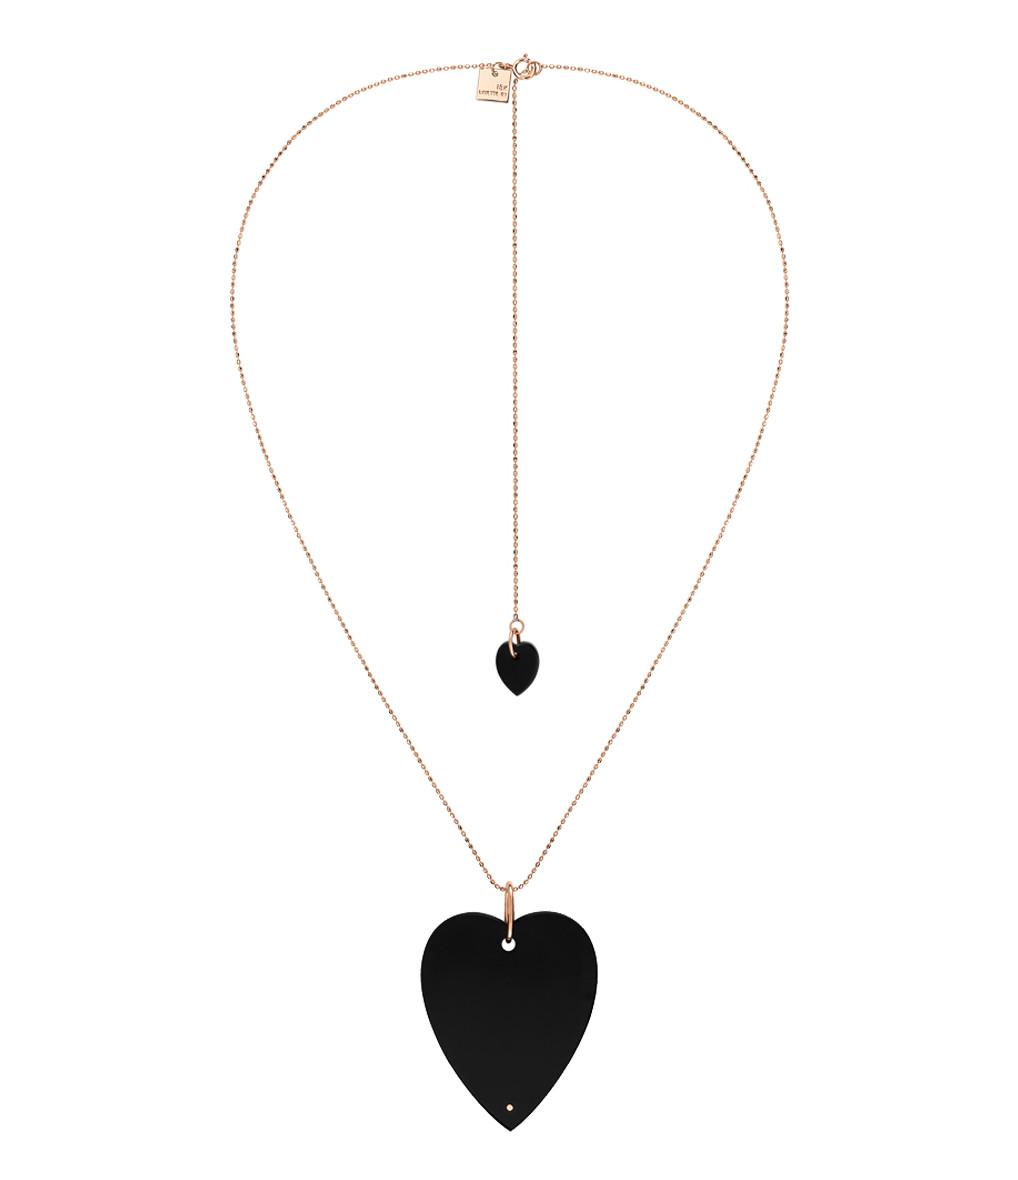 GINETTE_NY - Collier Angele Jumbo Coeur Onyx